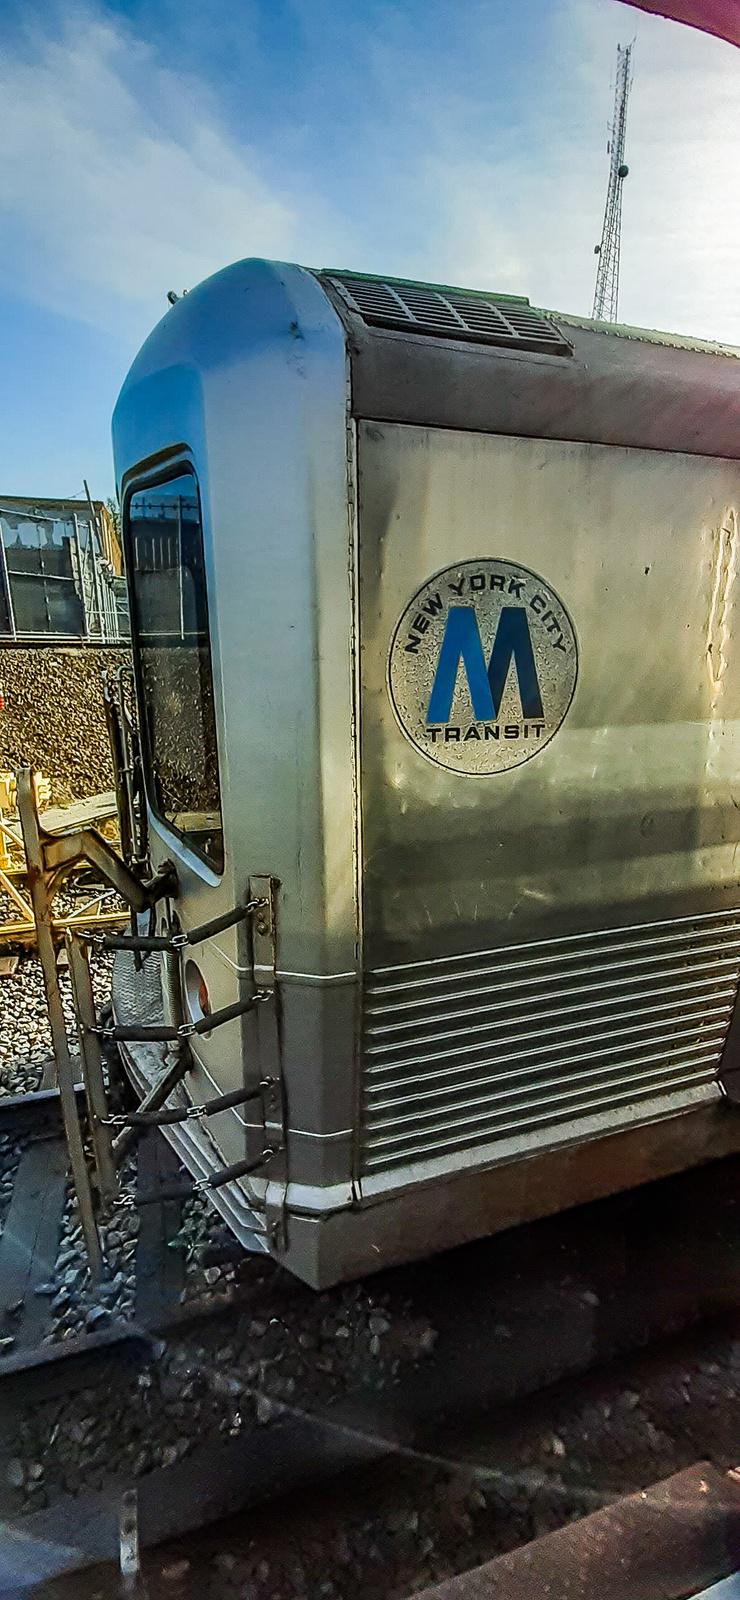 (371k, 1044x866)<br><b>Country:</b> United States<br><b>City:</b> New York<br><b>System:</b> New York City Transit<br><b>Line:</b> BMT Canarsie Line<br><b>Location:</b> Atlantic Avenue <br><b>Route:</b> Fan Trip<br><b>Car:</b> BMT Elevated Gate Car  <br><b>Photo by:</b> Joel Shanus<br><b>Viewed (this week/total):</b> 0 / 2213